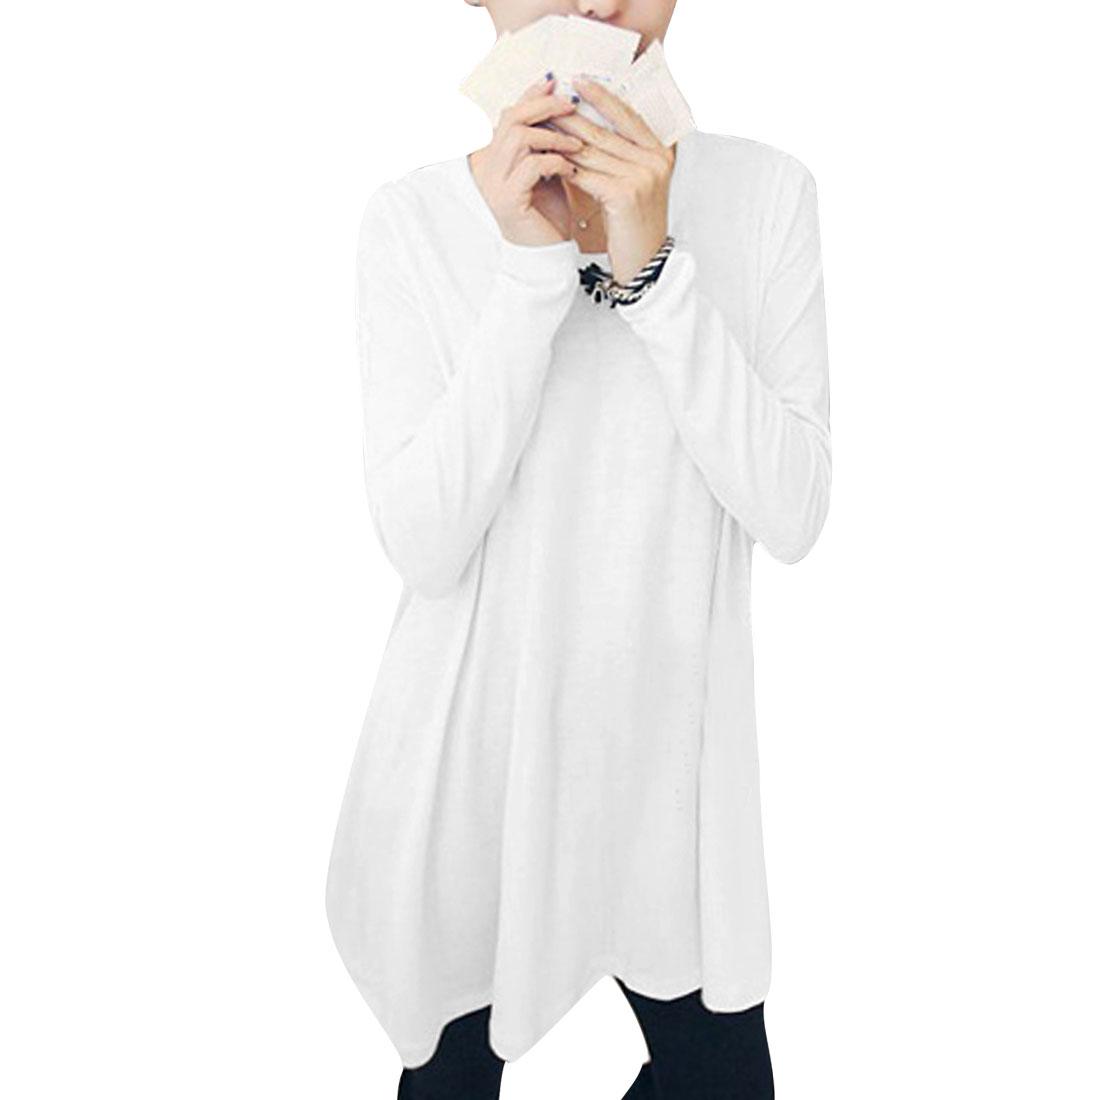 Women Pullover Design Stylish Elastic Semi Sheer Tunic Shirt White XS